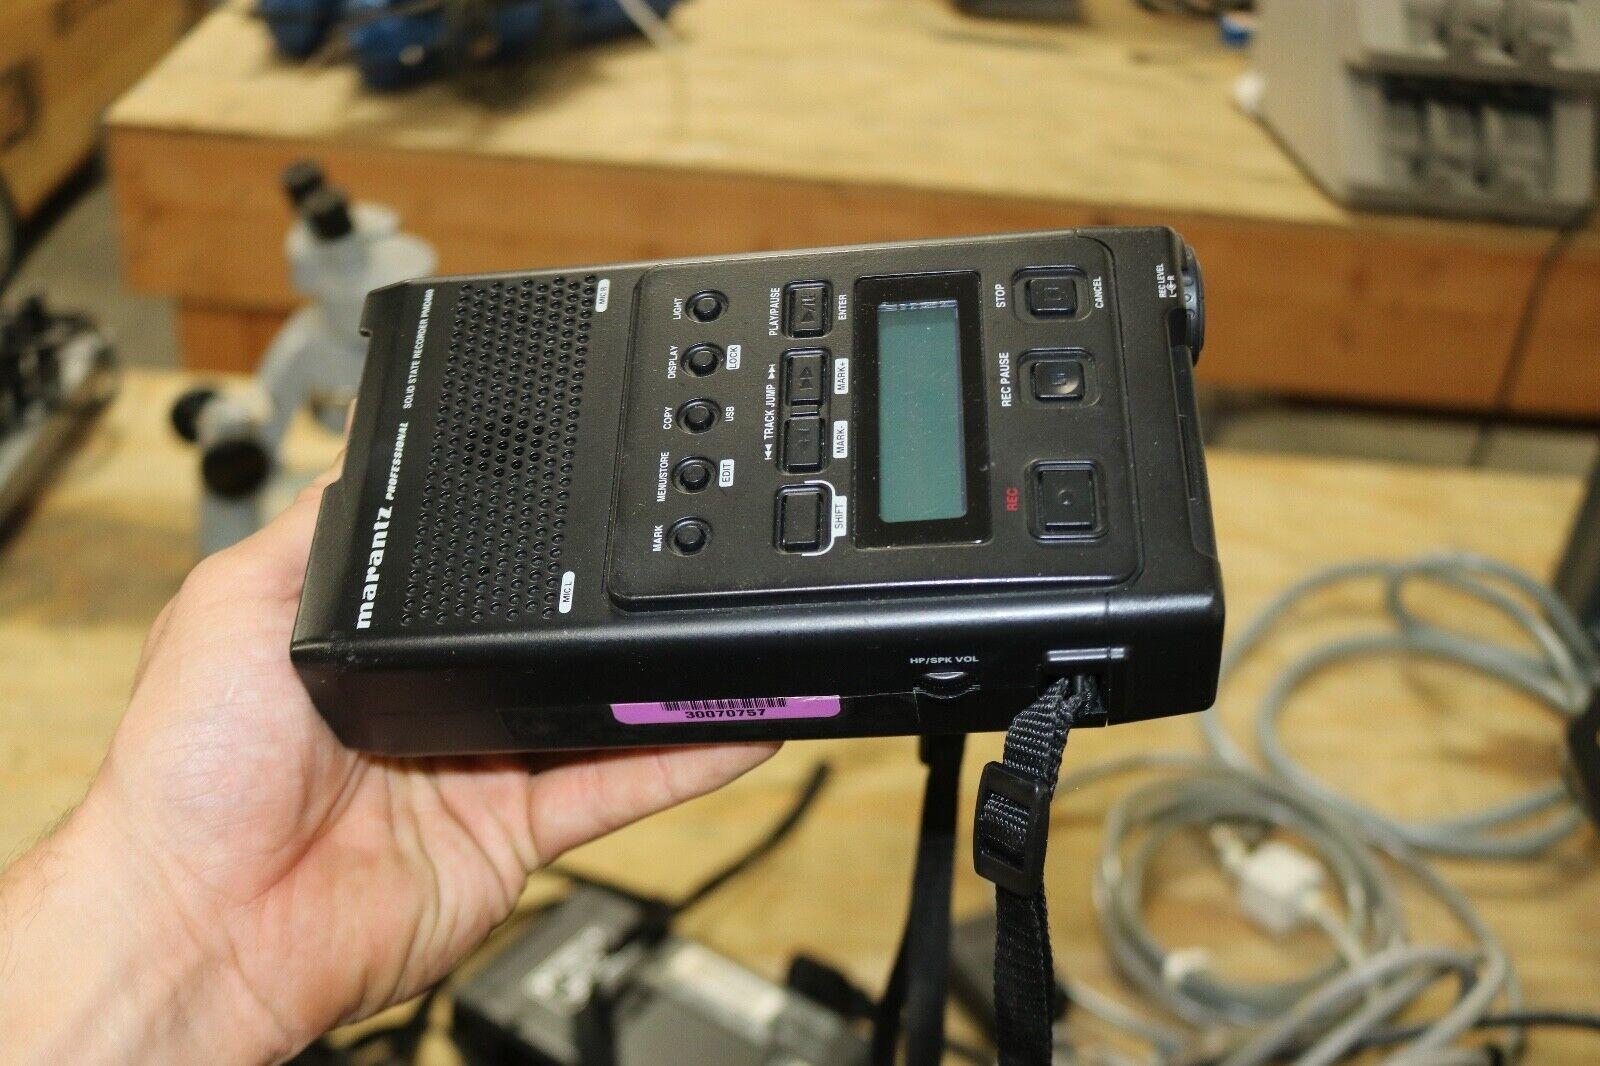 Marantz PMD660 Handheld Digital Voice Recorder WORKING